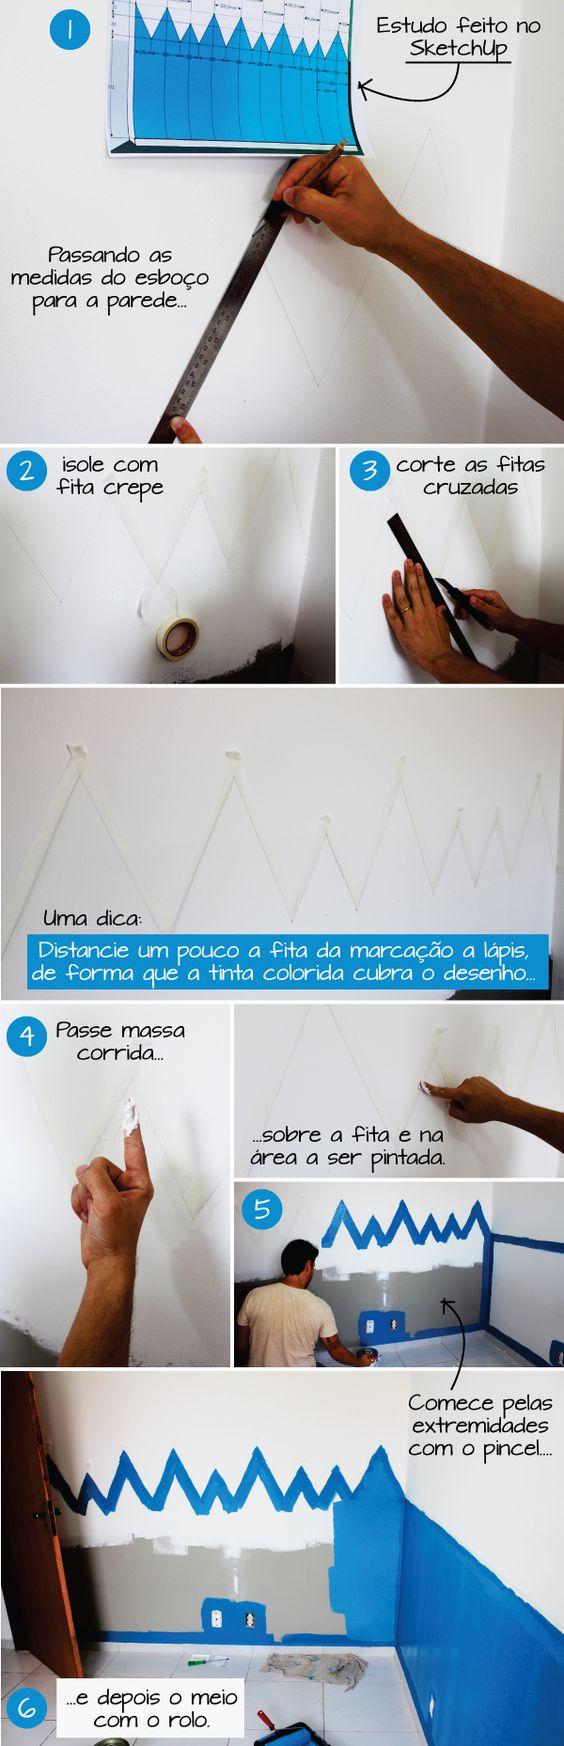 Transforlar: Como fizemos uma pintura ZigZag na parede